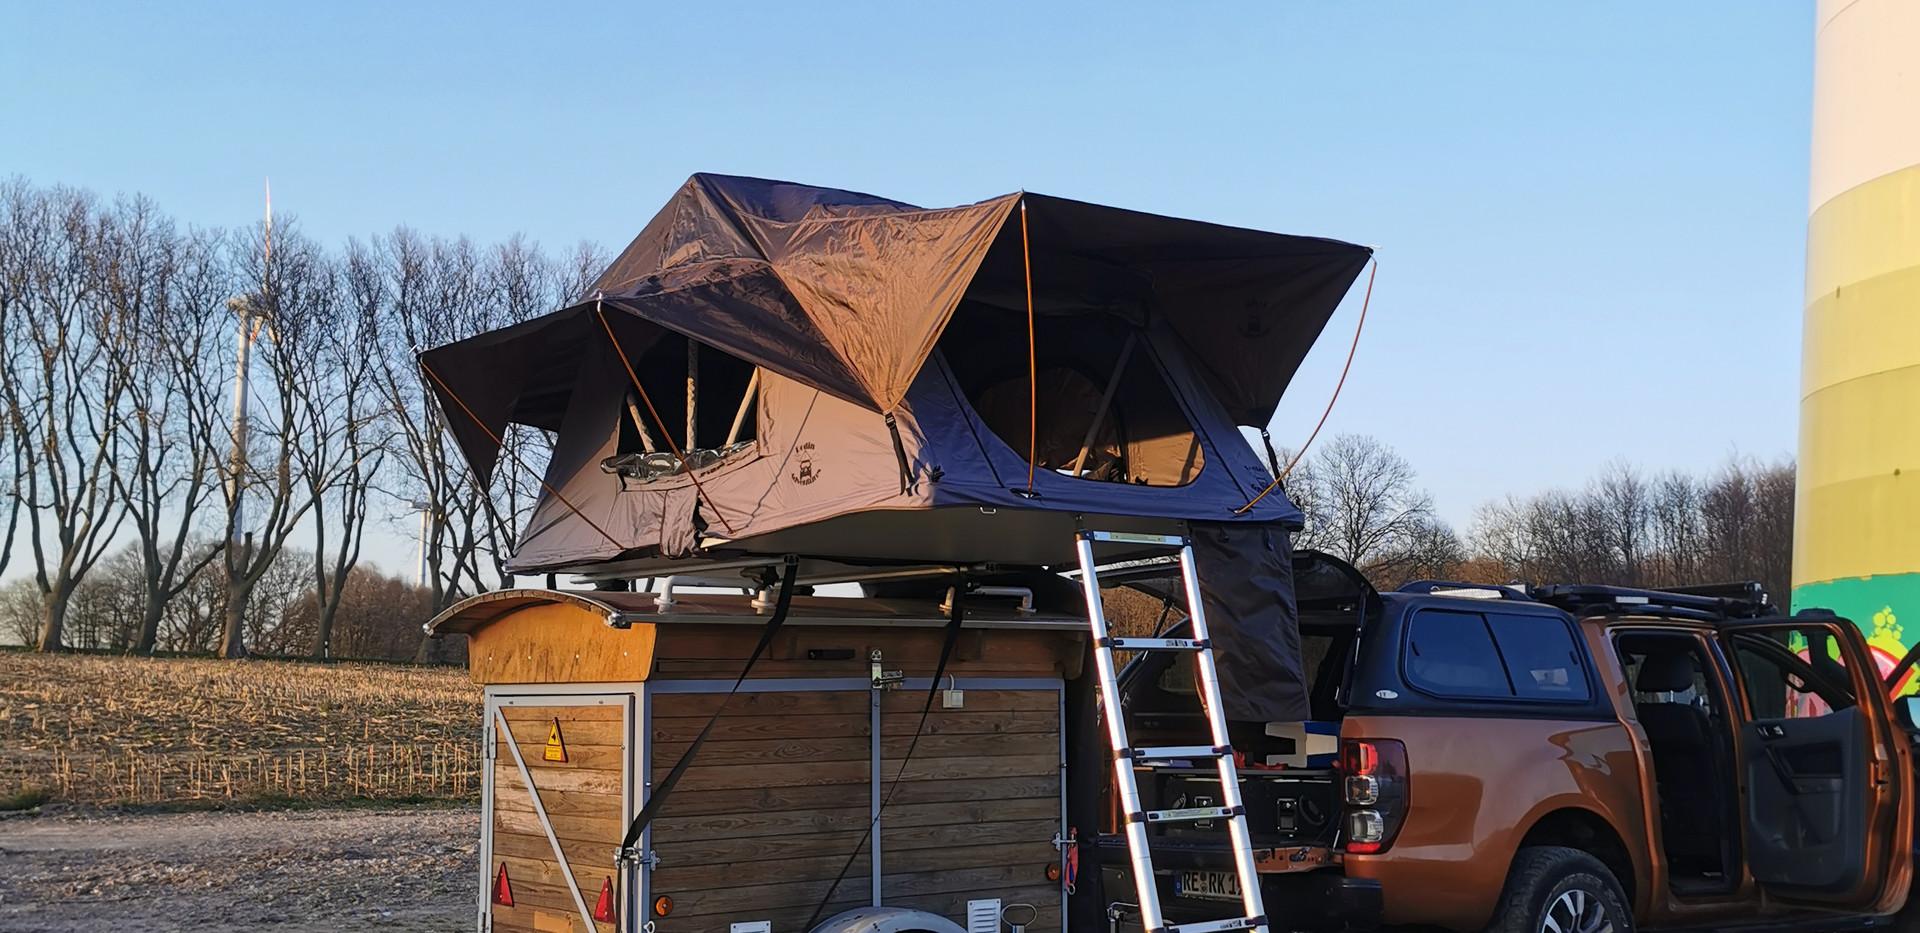 Forester auf unserem Base-Camp-Anhänger.